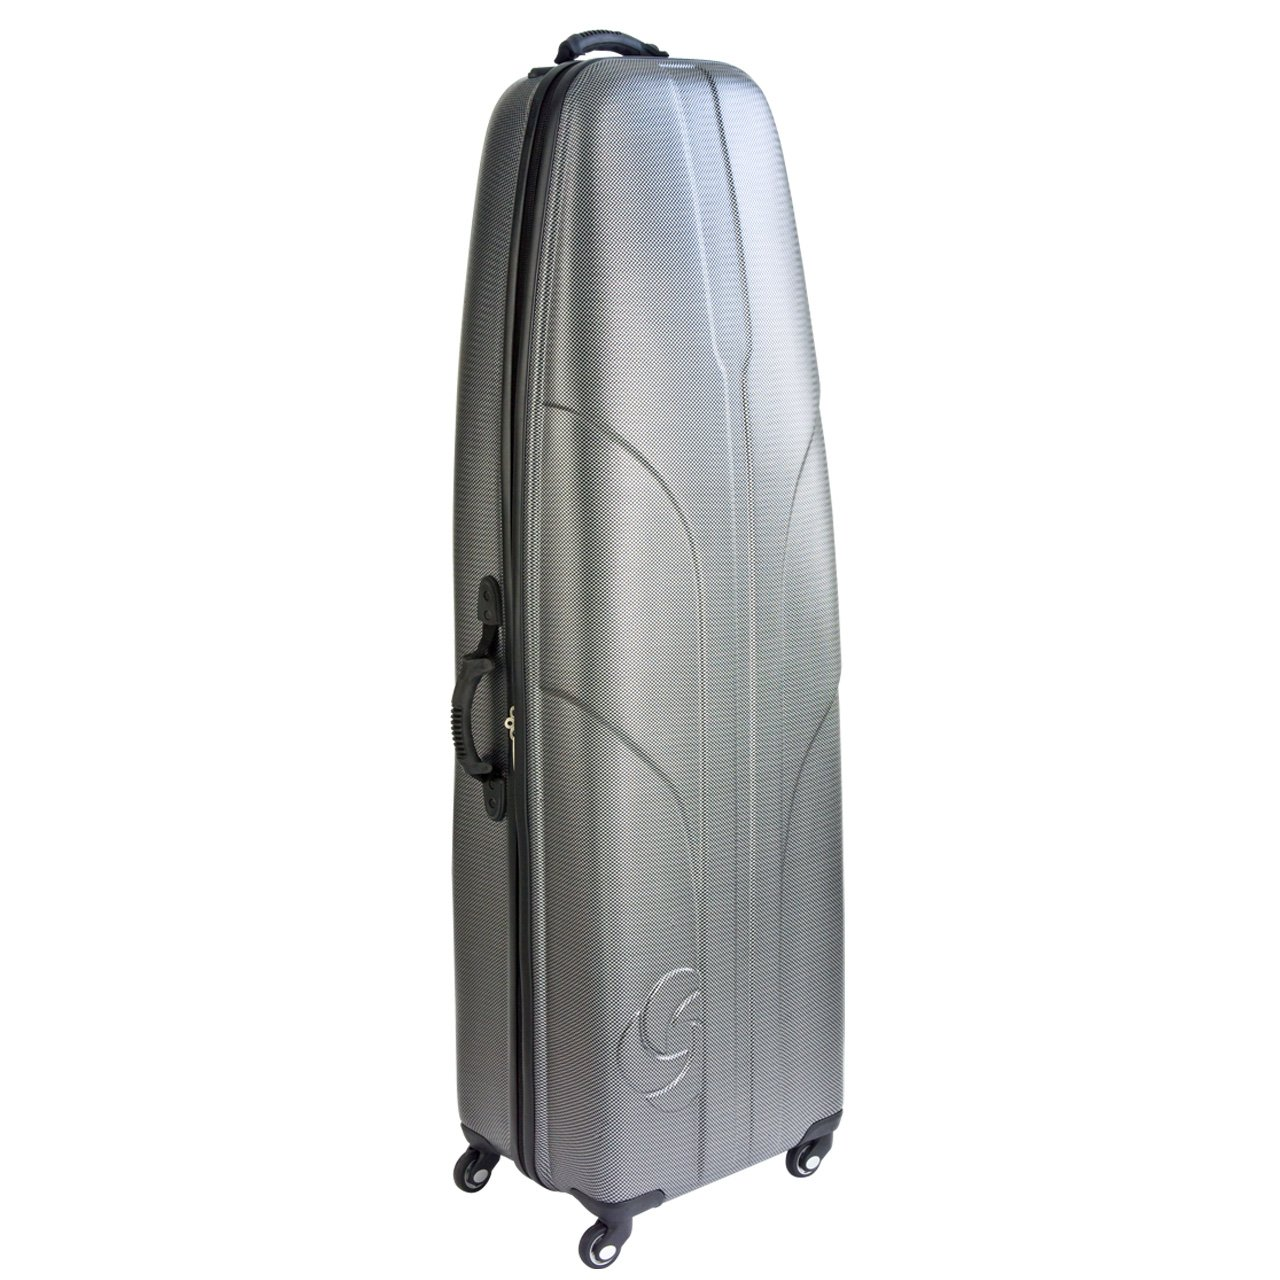 Samsonite Golf Hard-Sided Travel Cover Case, Titanium by Samsonite